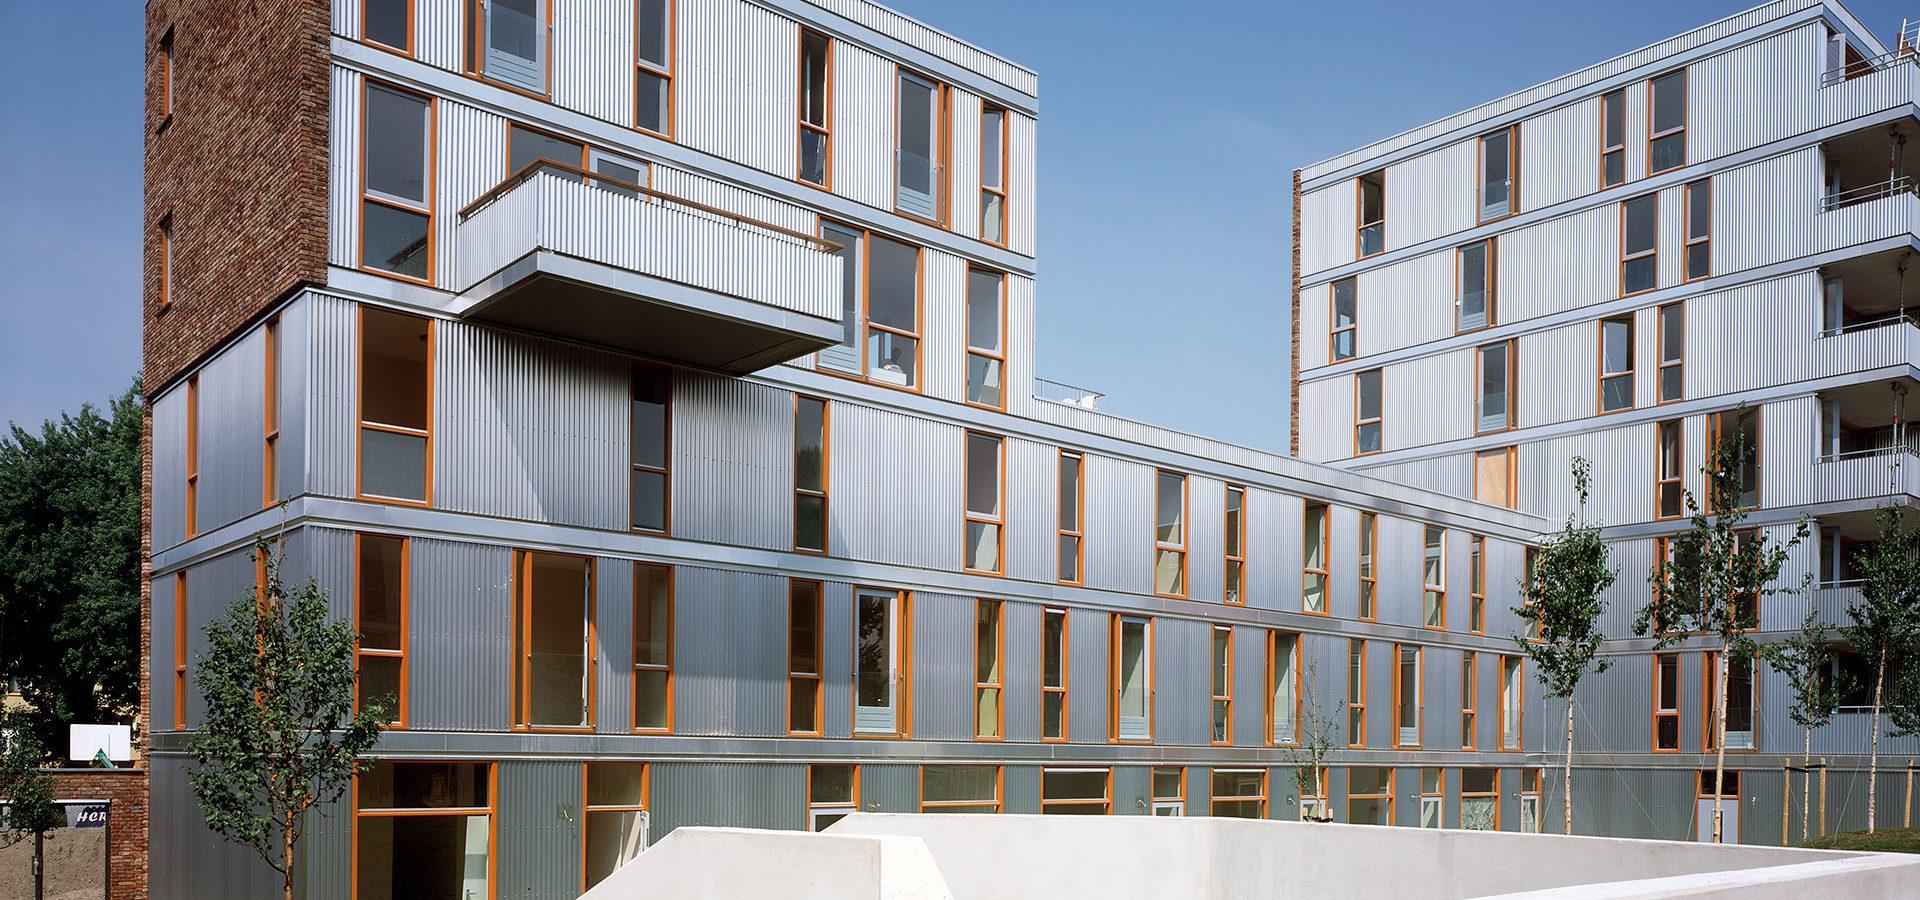 FARO architecten Geuzentuinen Amsterdam 09